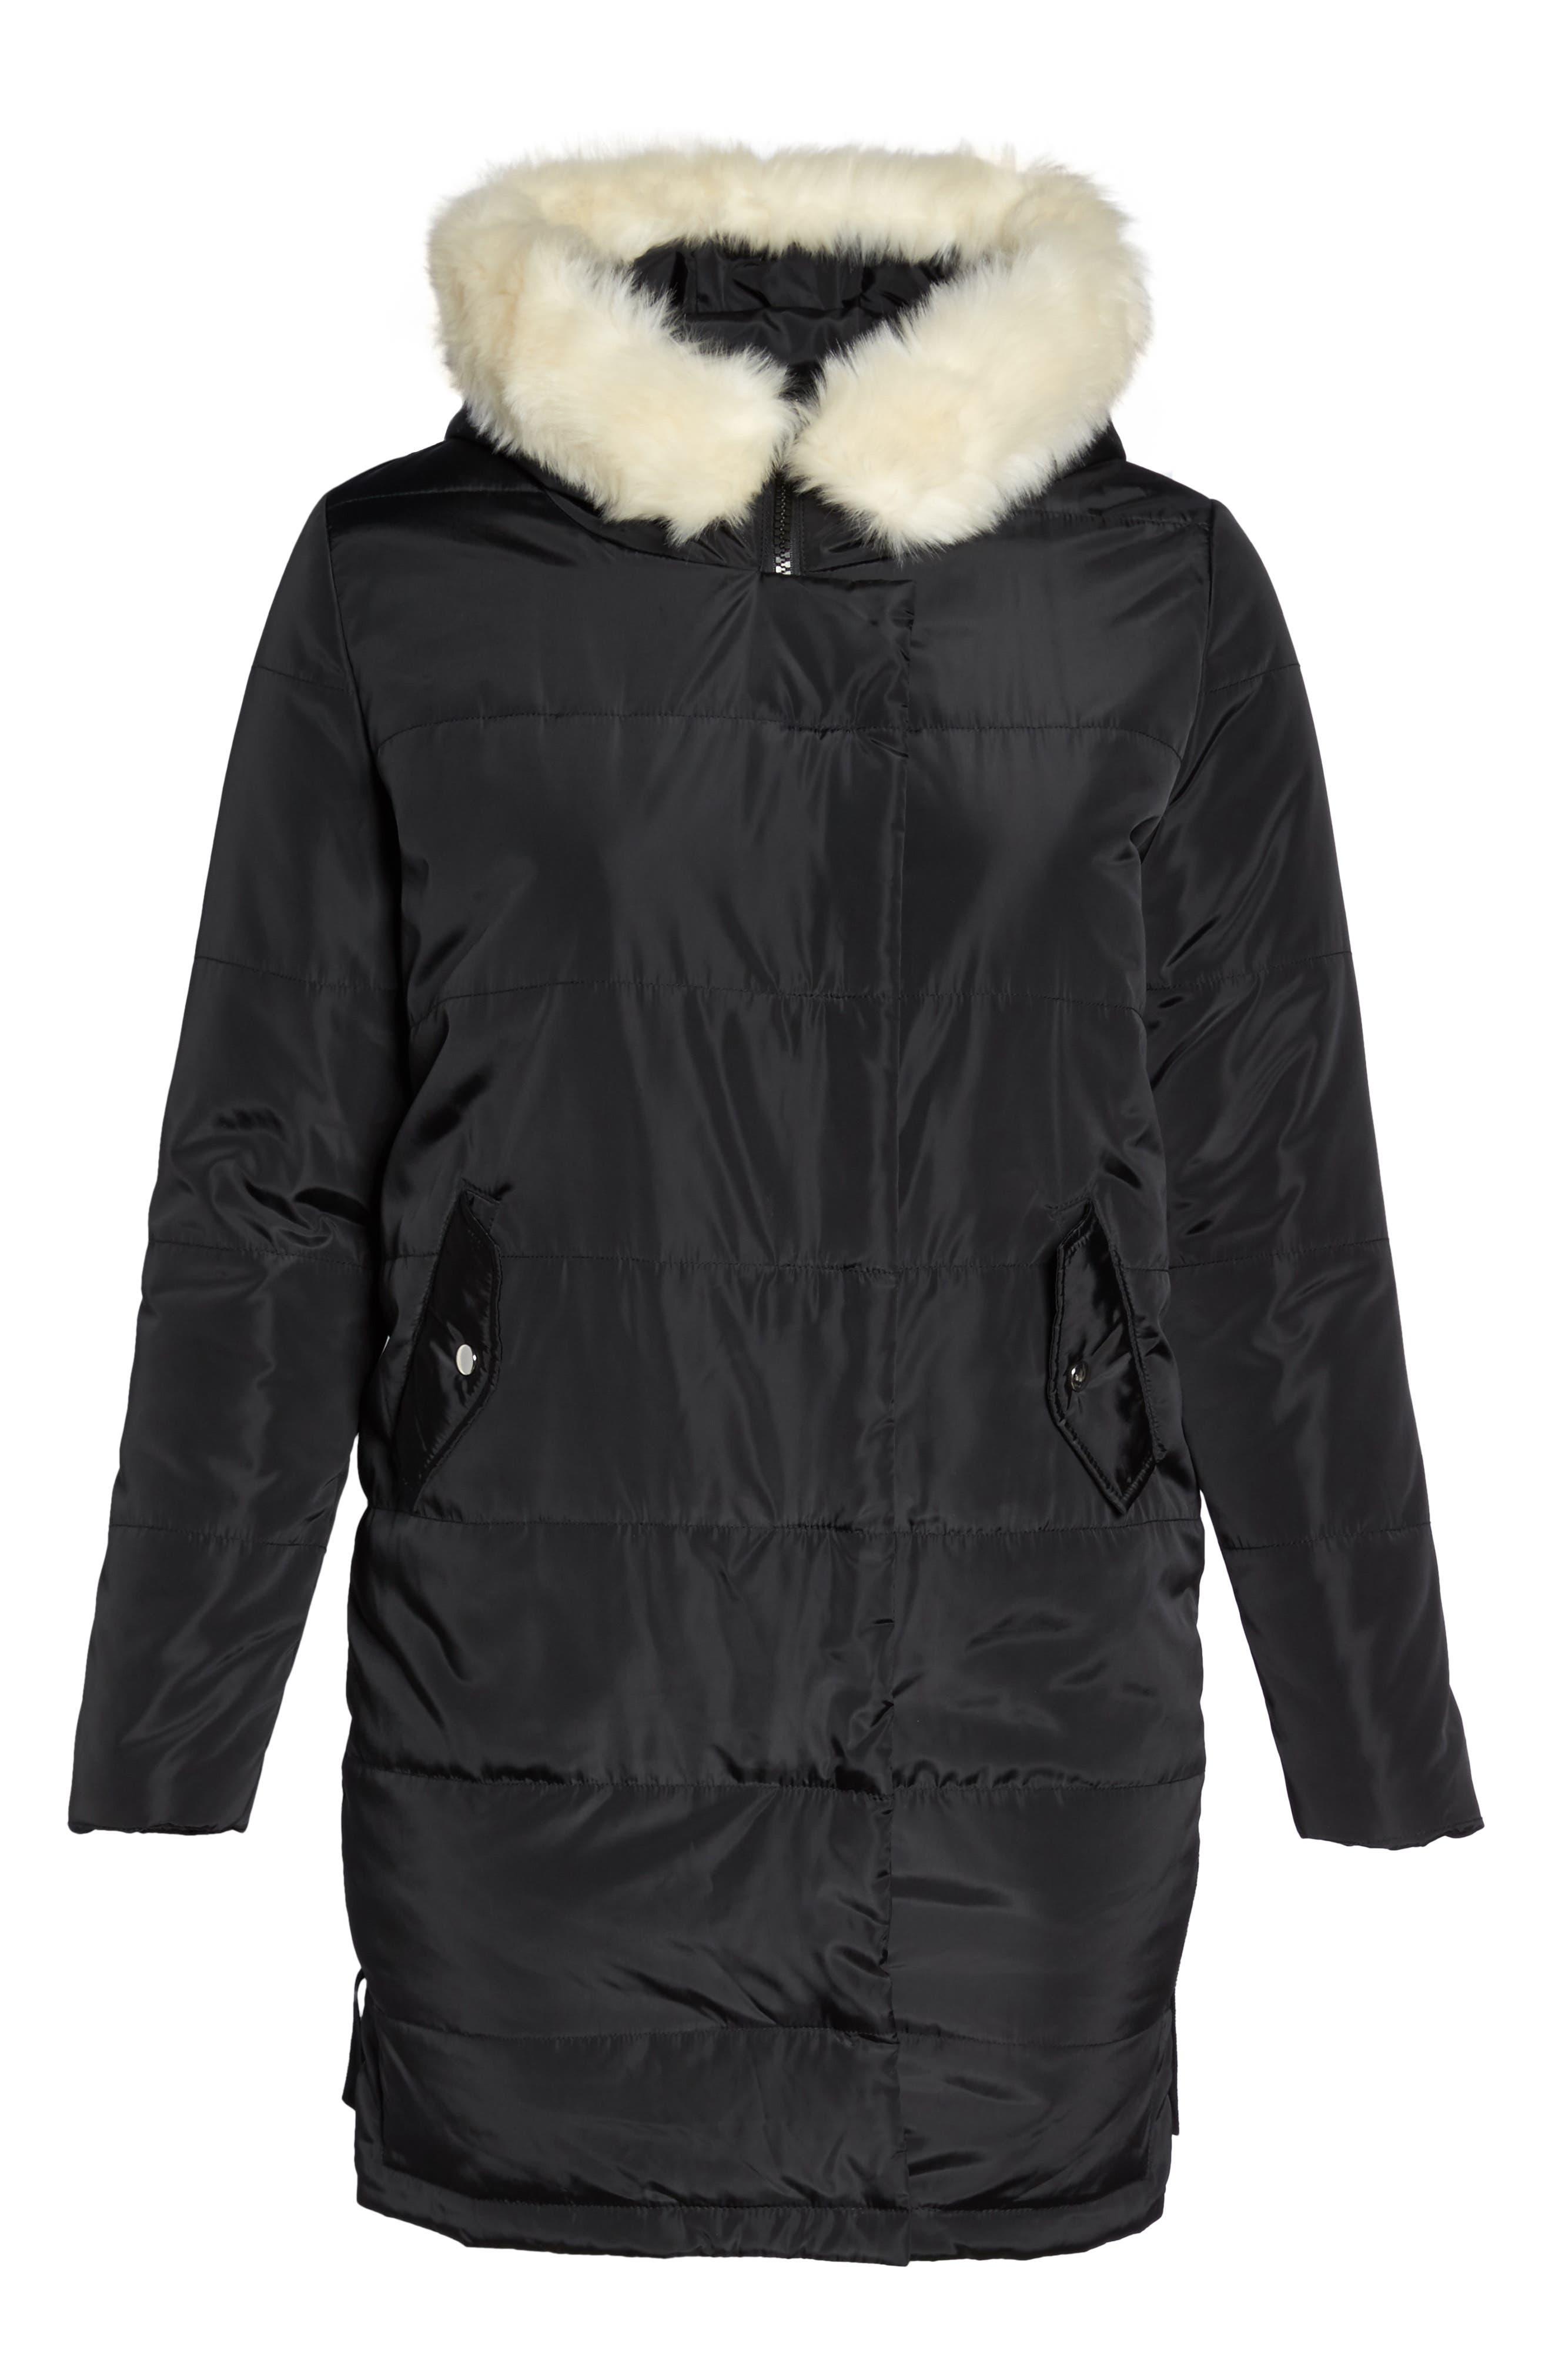 Puffer Coat with Faux Fur Trim,                             Alternate thumbnail 6, color,                             Black